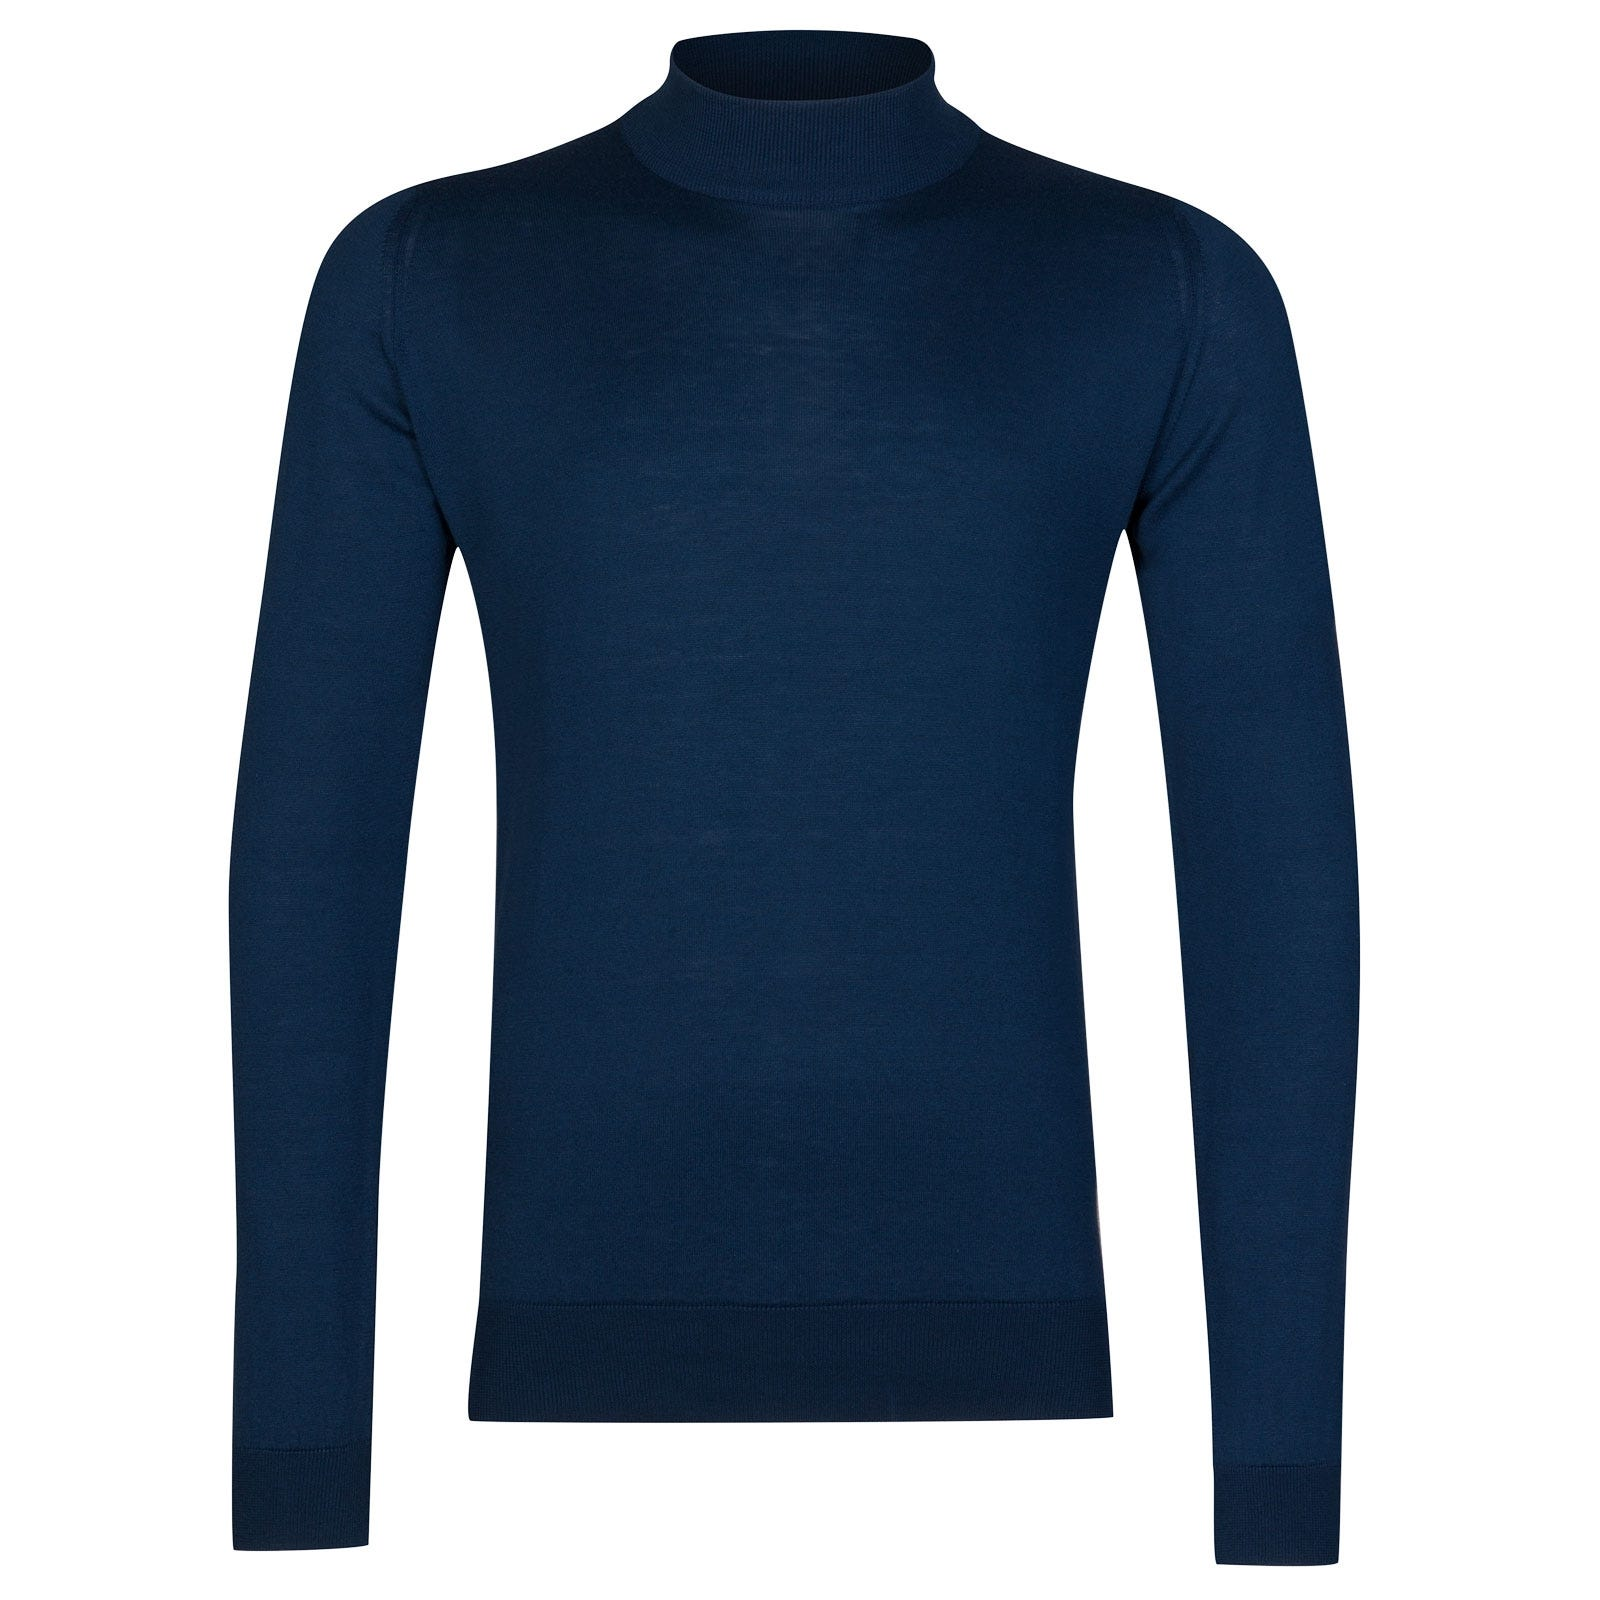 John Smedley Bradgate Sea Island Cotton Pullover in Indigo-XS